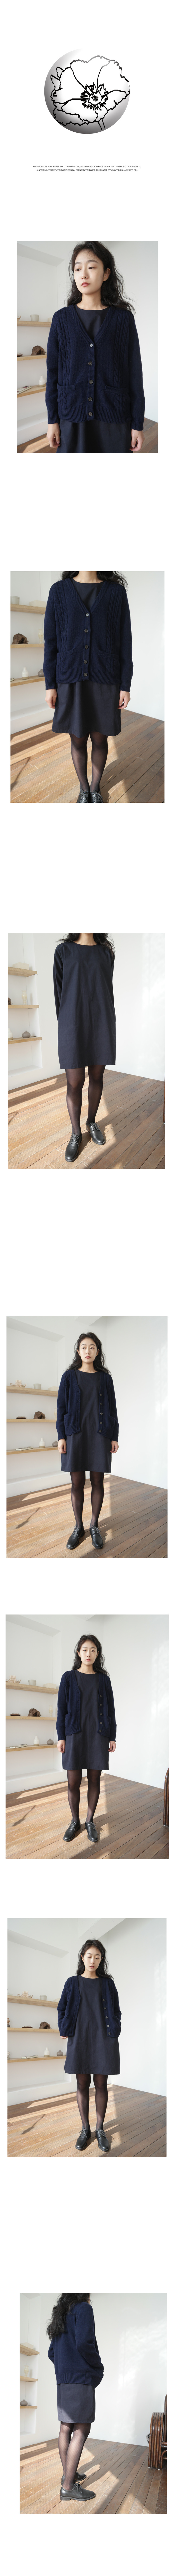 clean silhouette dress 2